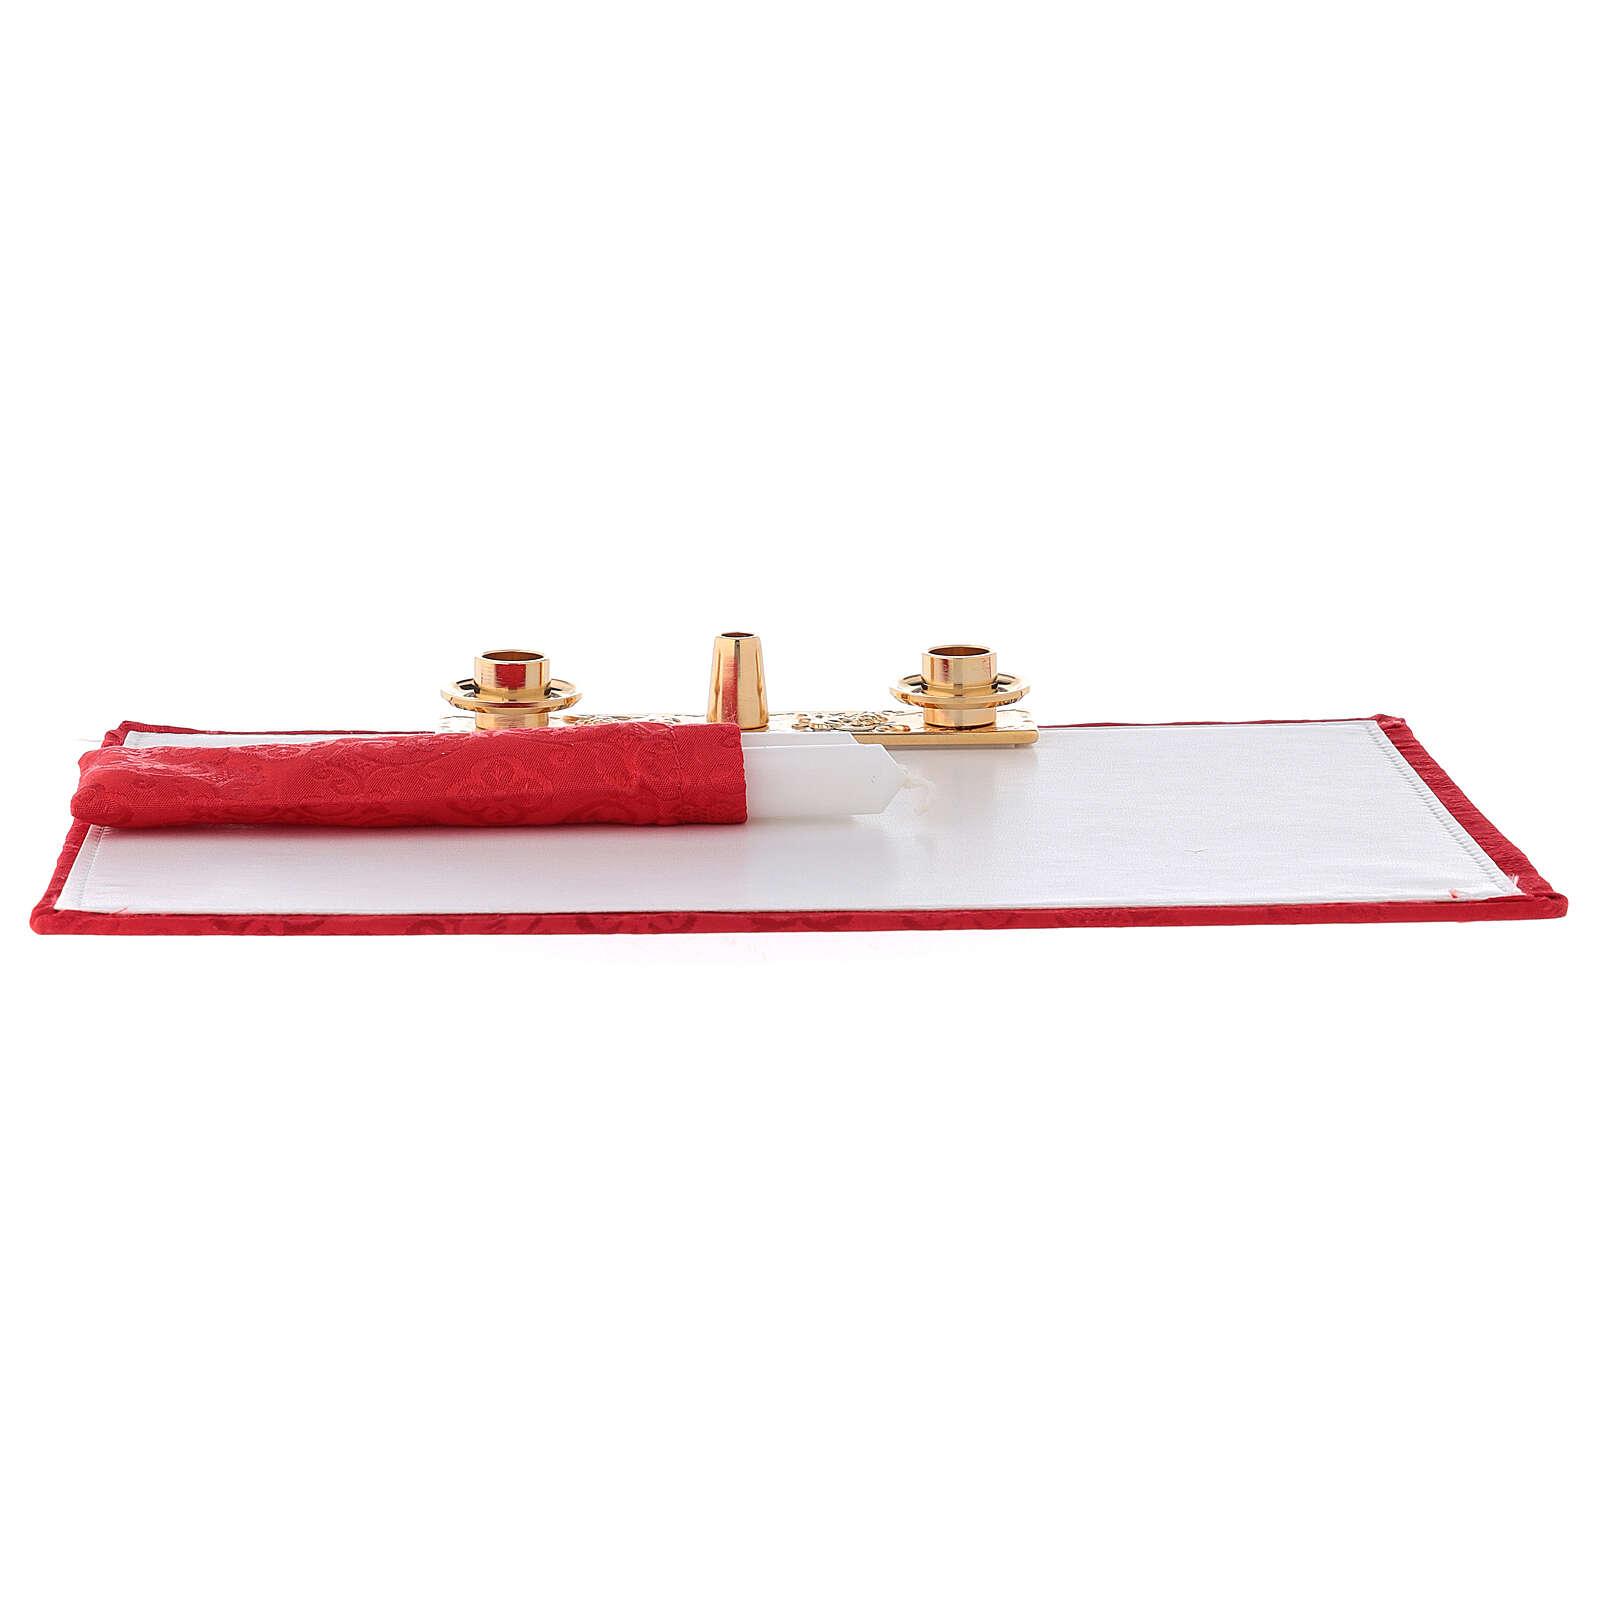 Maleta para celebraciones ABS jacquard rojo con set 3